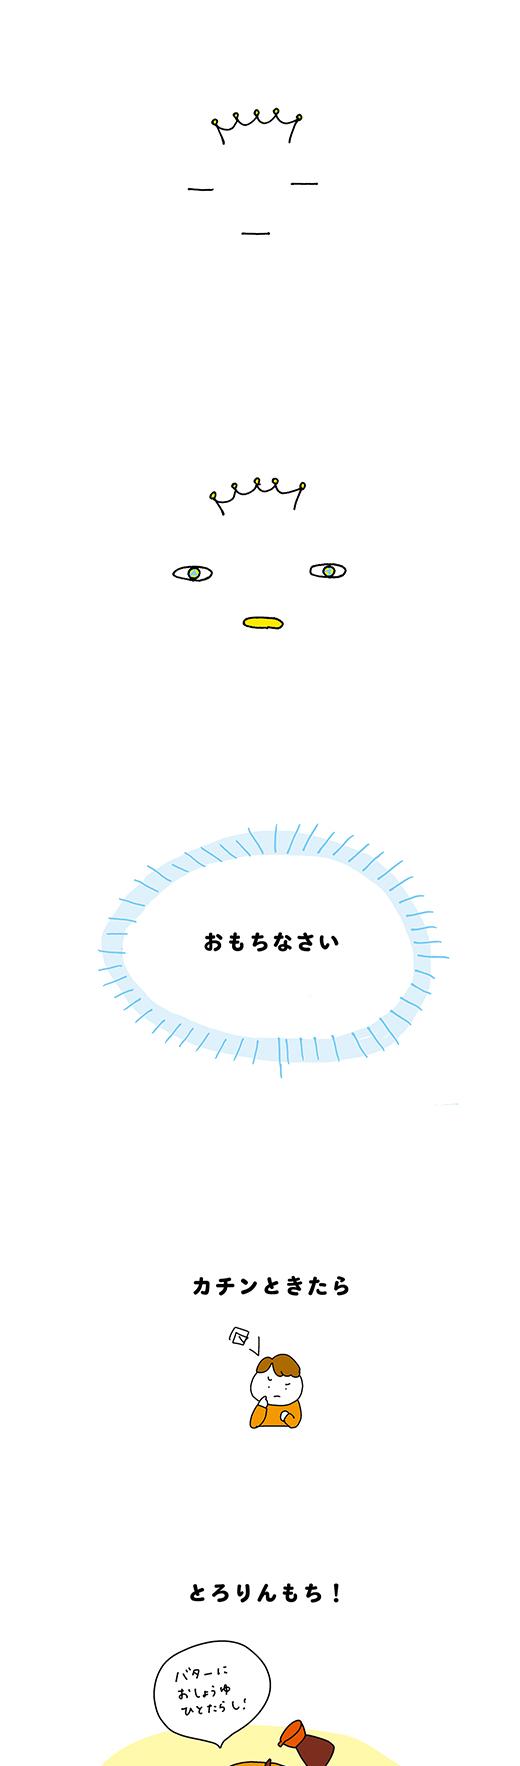 210113_kotaete2_01